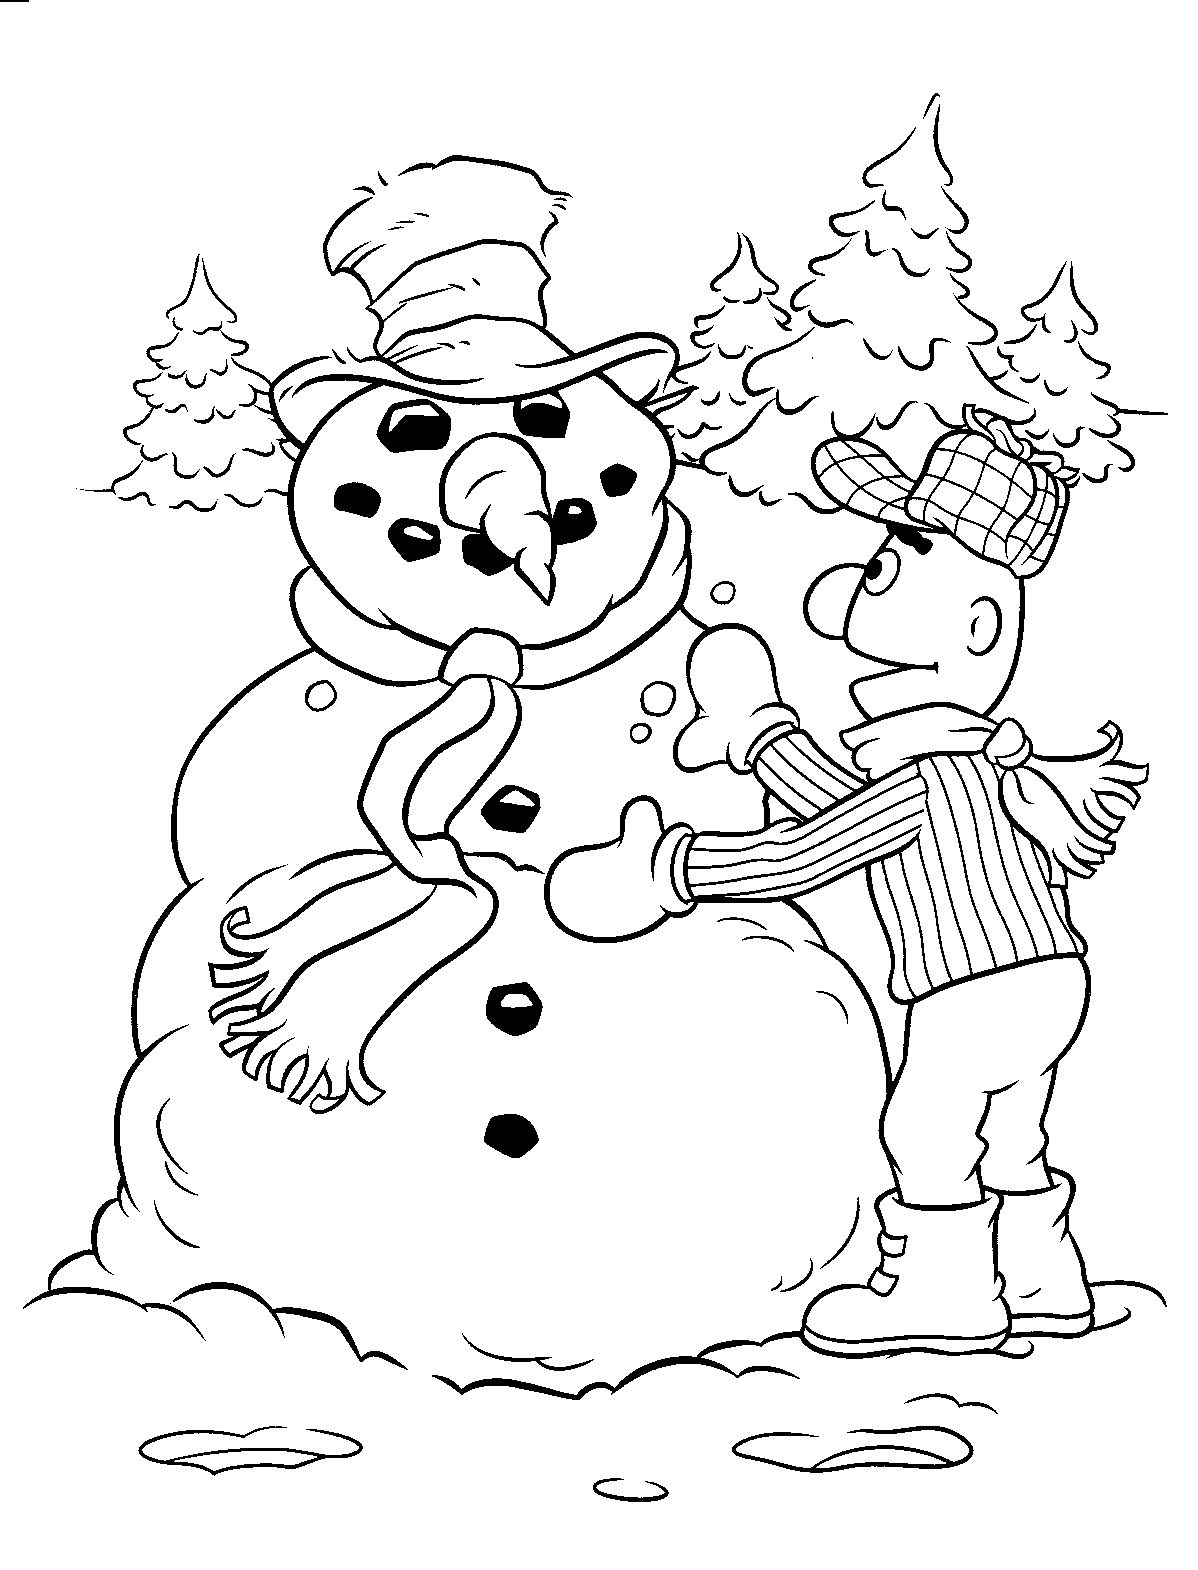 Único Navidad De Sésamo Para Colorear Elaboración - Ideas Para ...